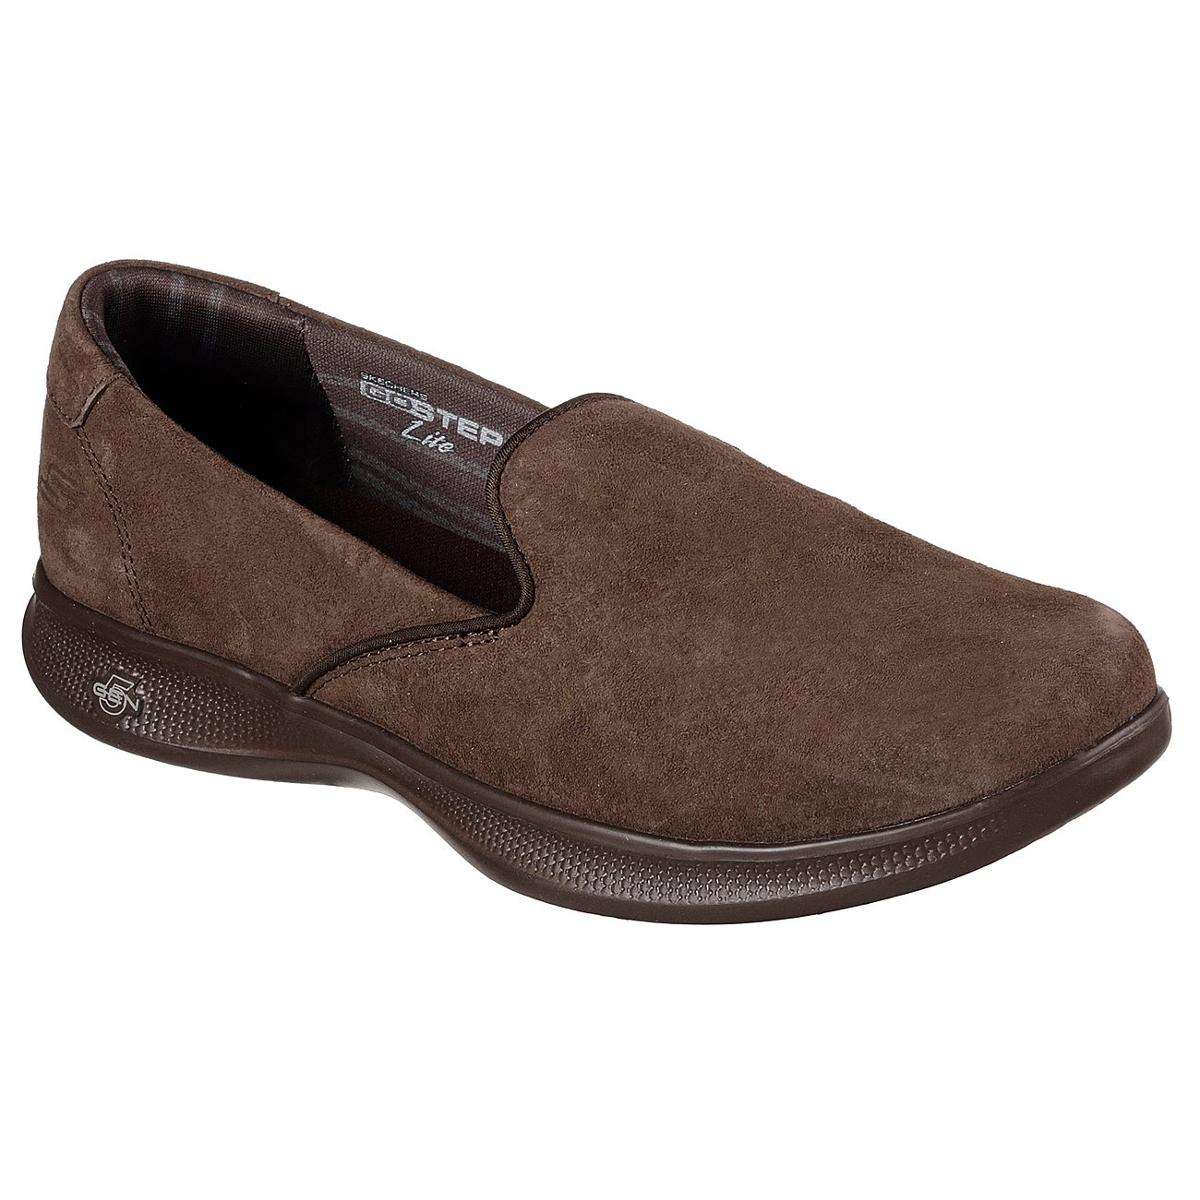 Skechers Women's Skechers Go Step Lite -  Indulge Casual Slip-On Shoes - Brown, 8